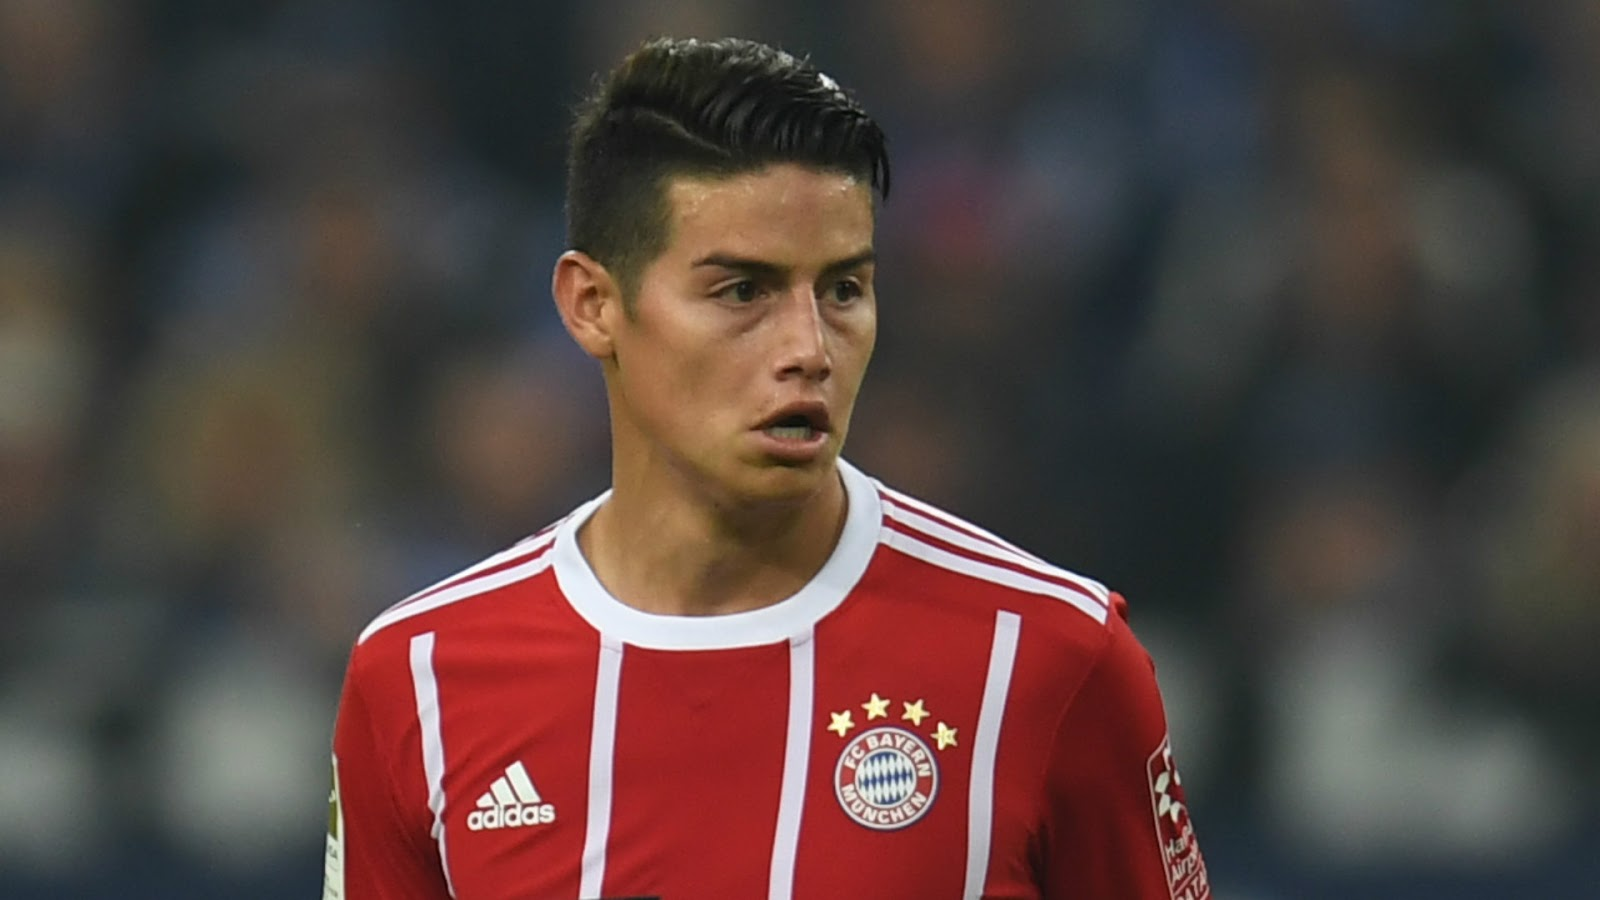 Kesal, James Rodriguez Ingin Tinggalkan Bayern Munich